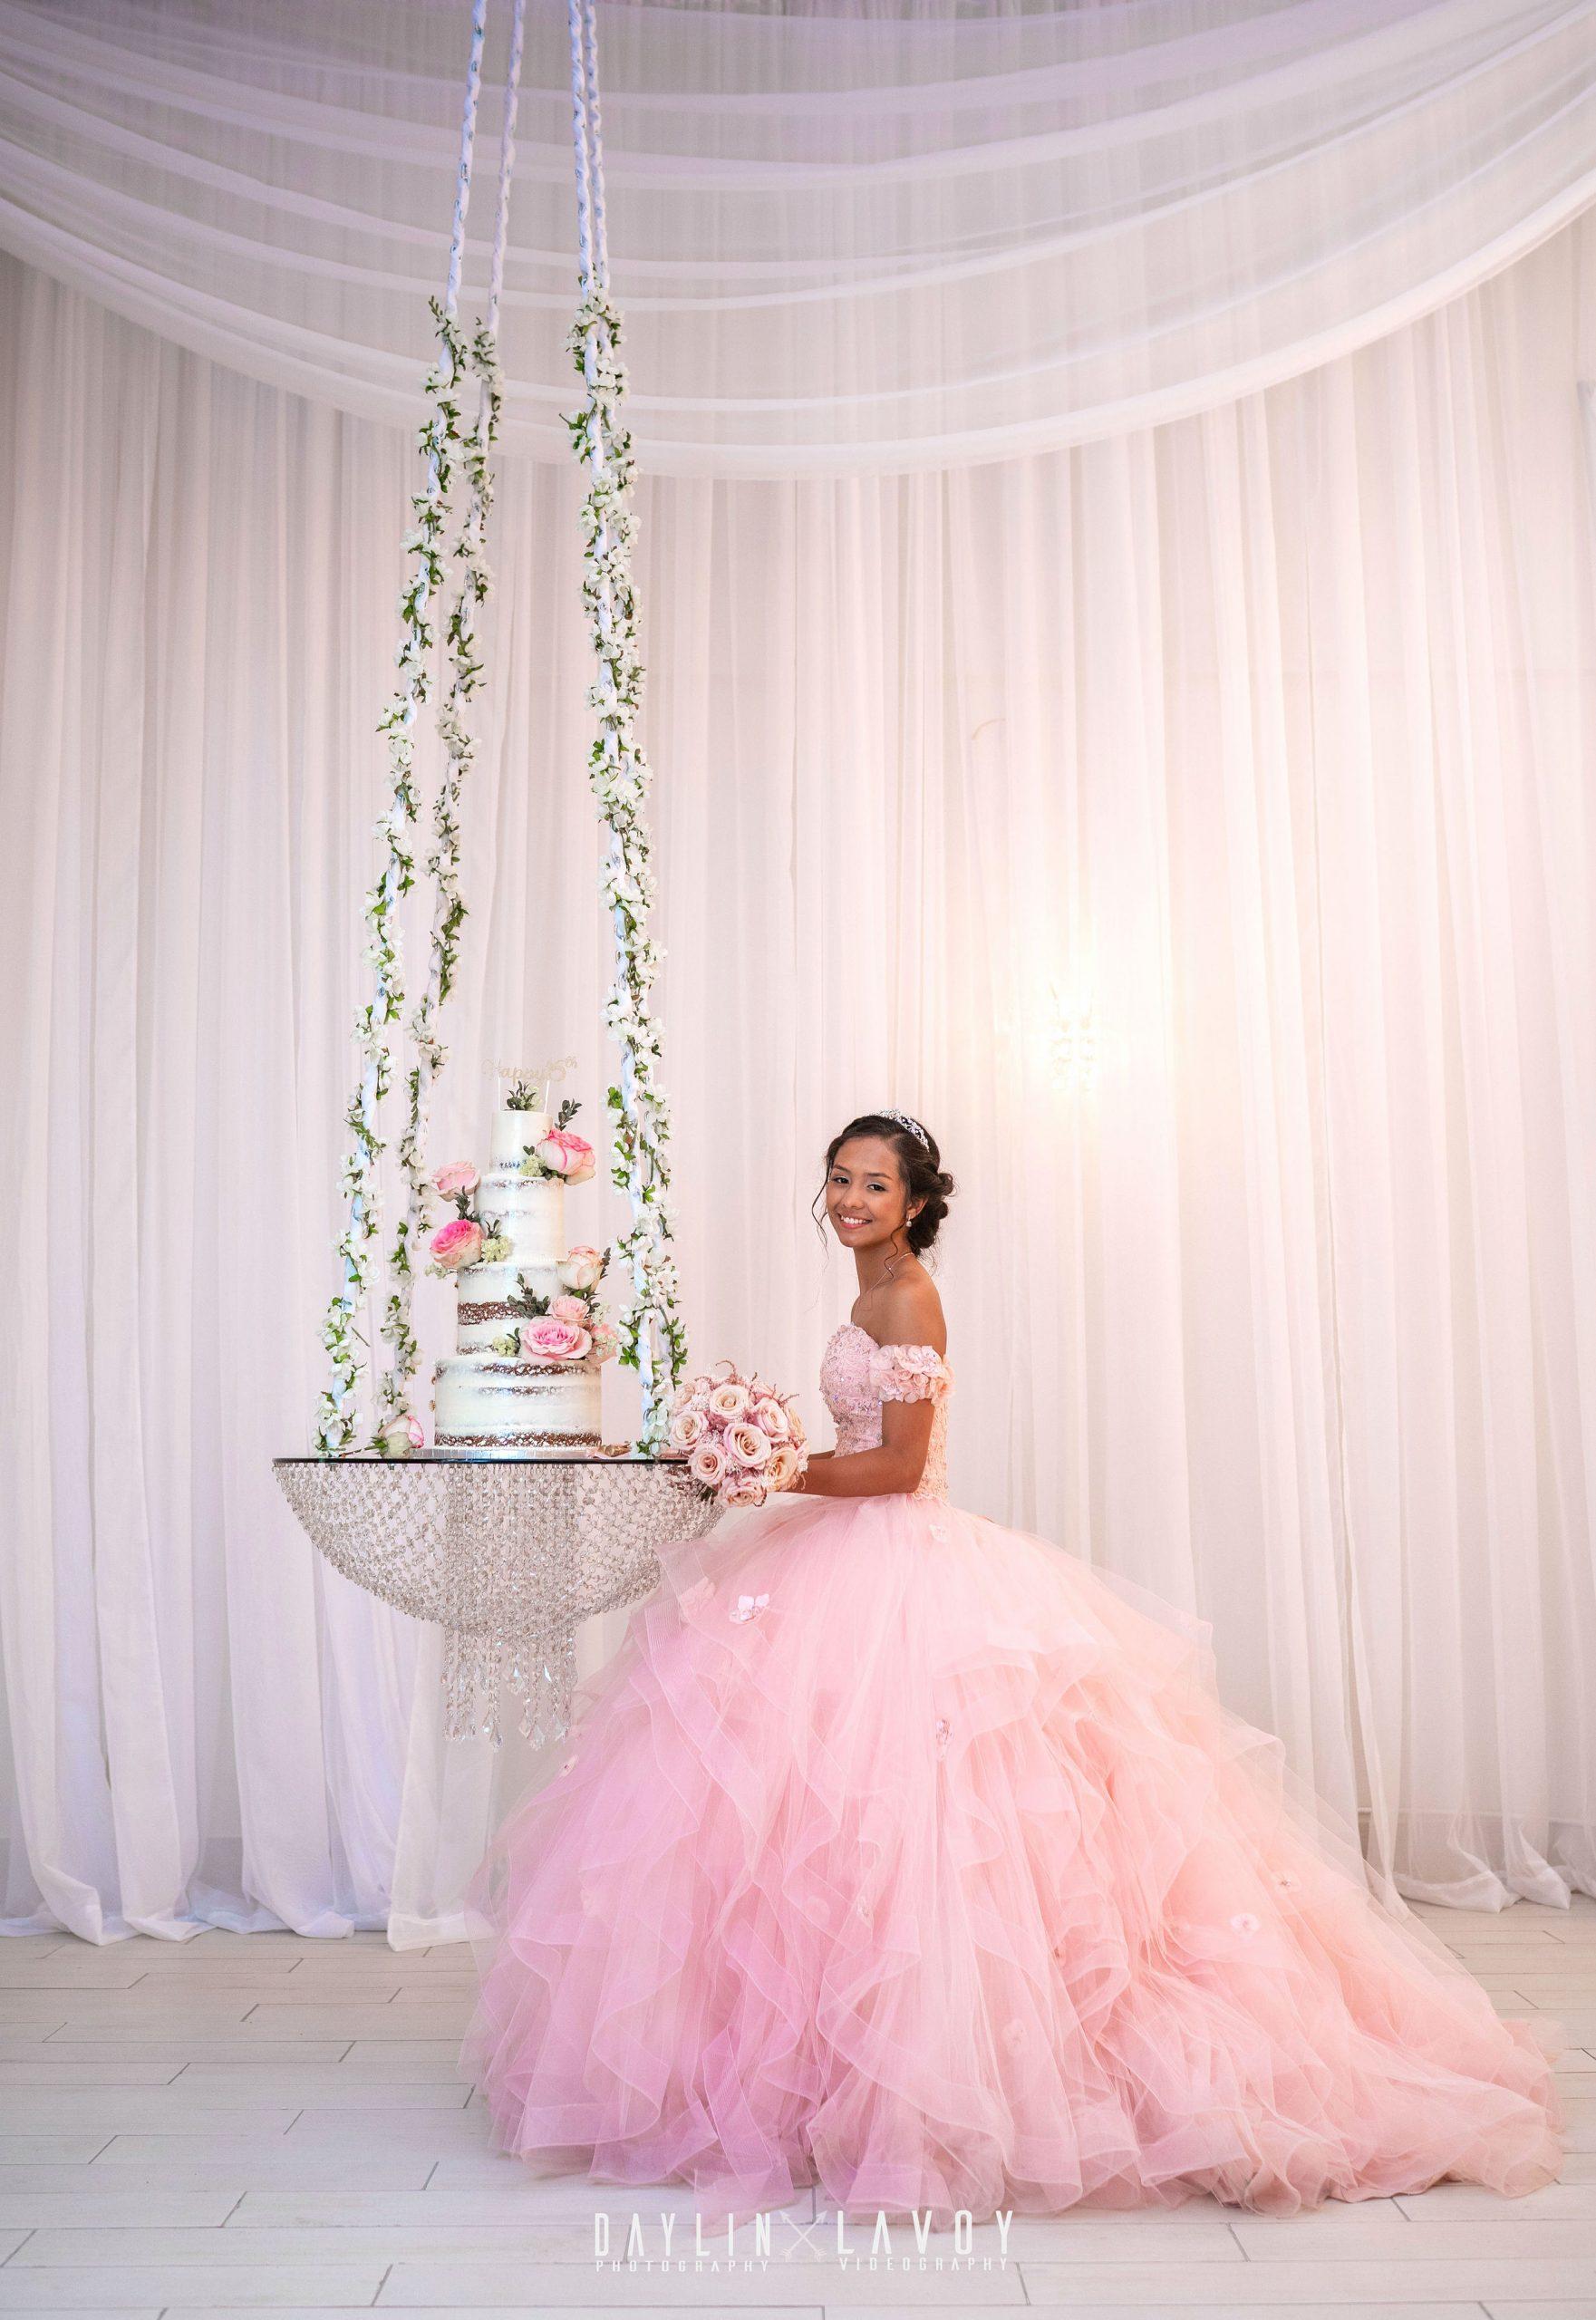 LeVenue Quinceañera cake swing and model